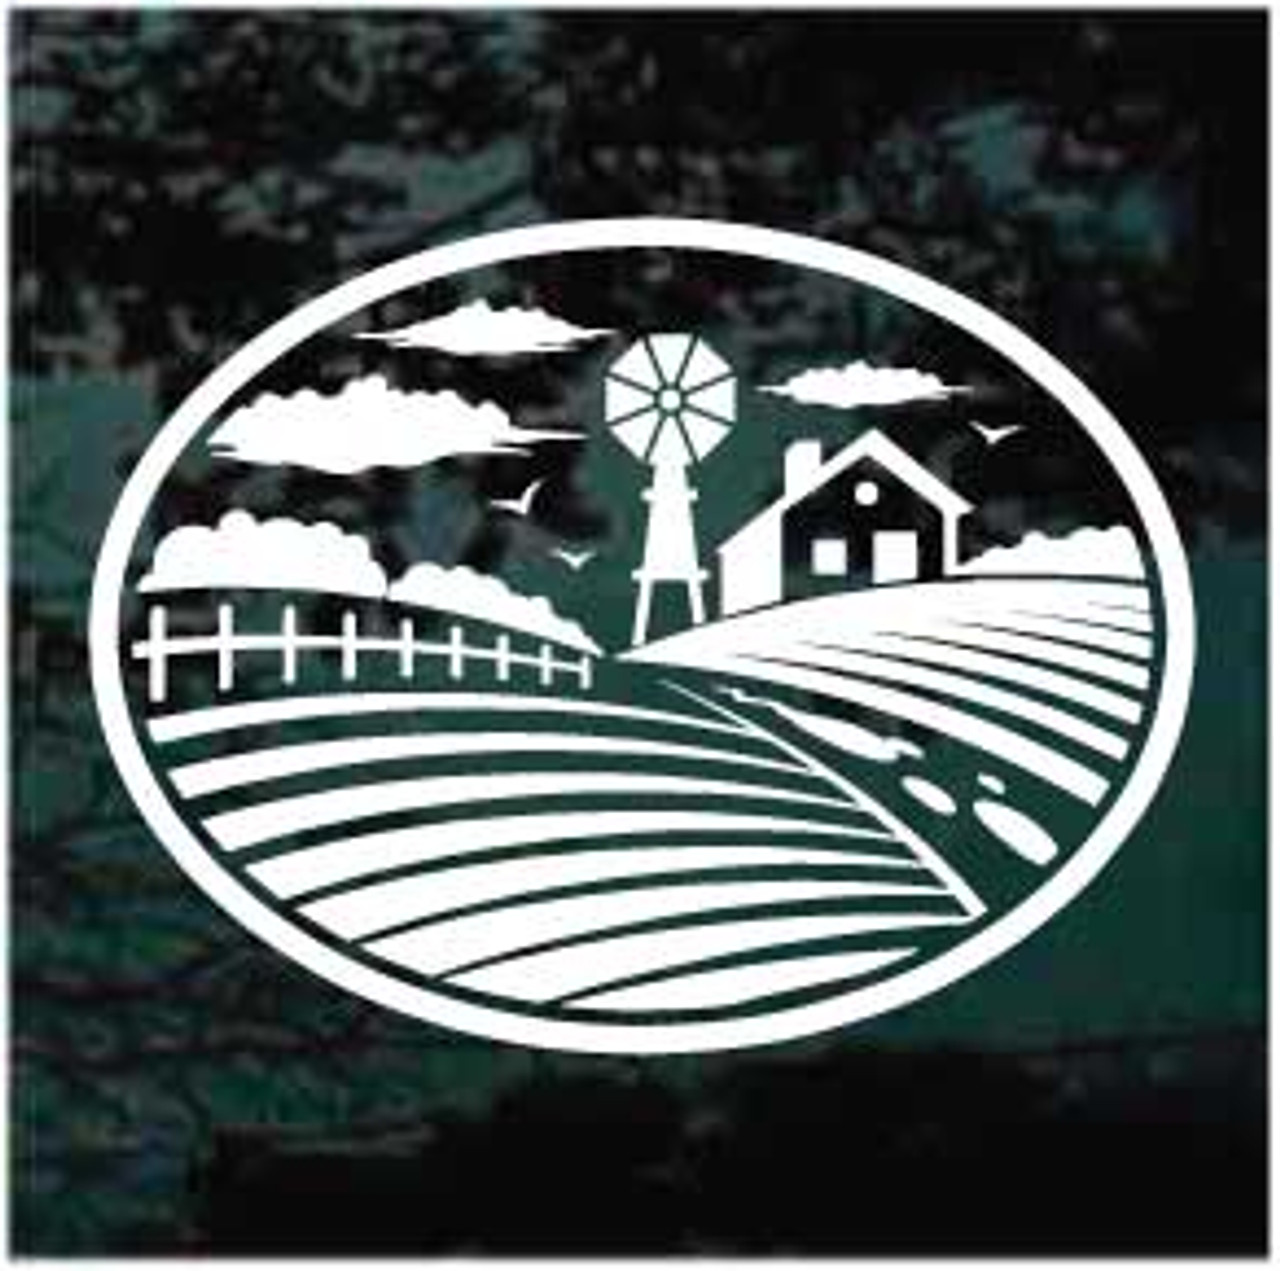 Farm Scene Oval Window Decal